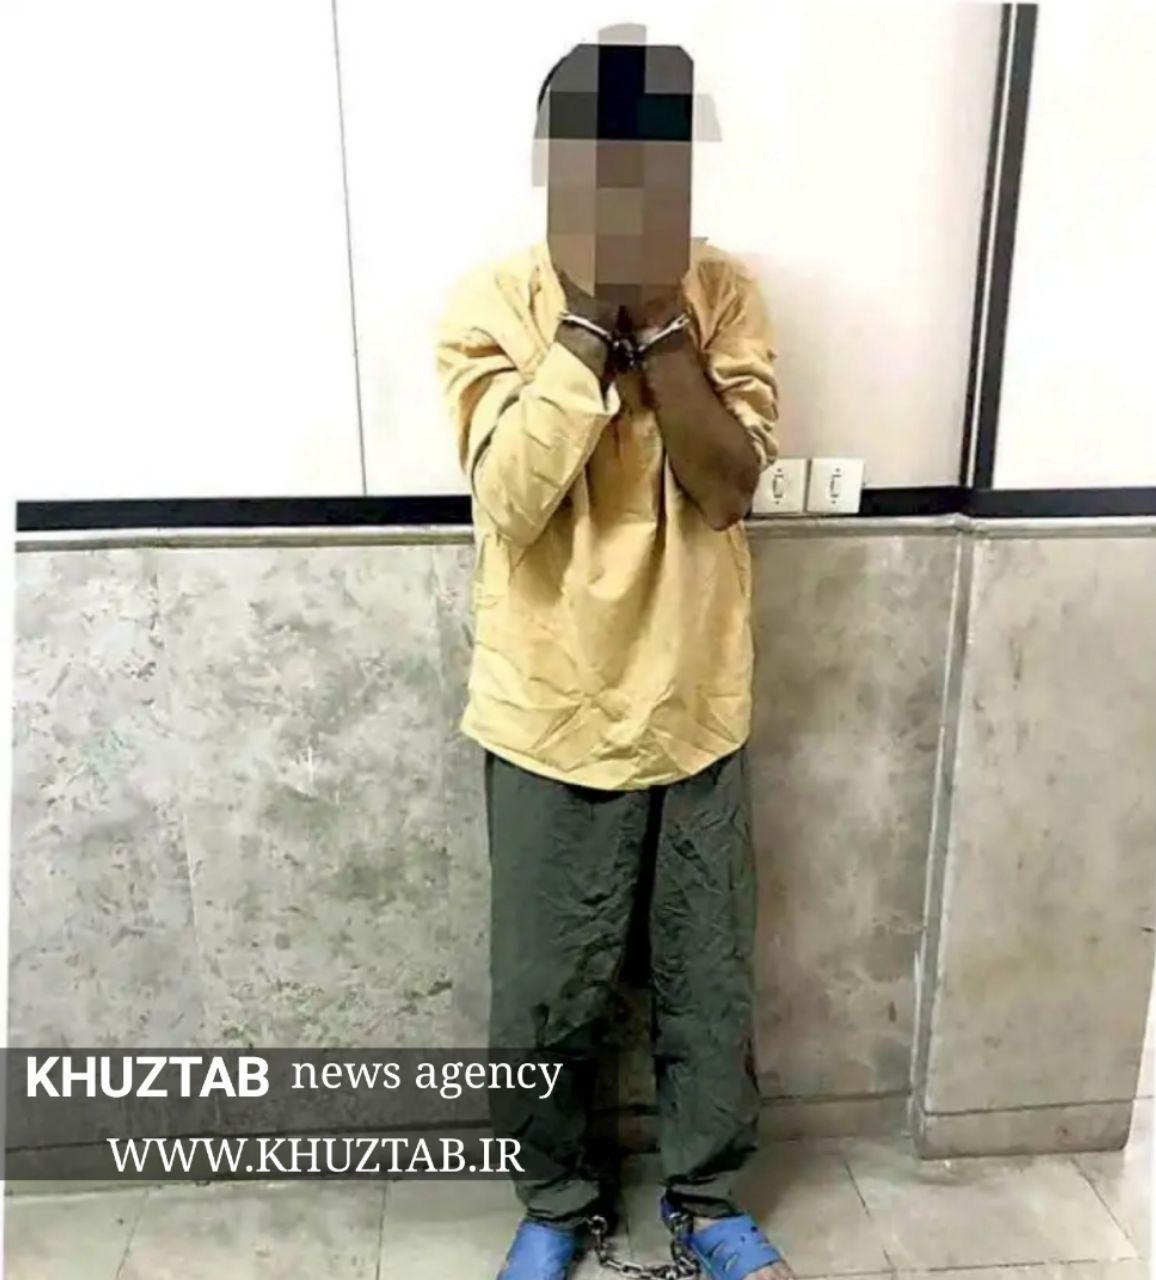 IMG 20190913 003343 418 برادری، خواهر خود را به علت عاشقی حلق اویز کرد